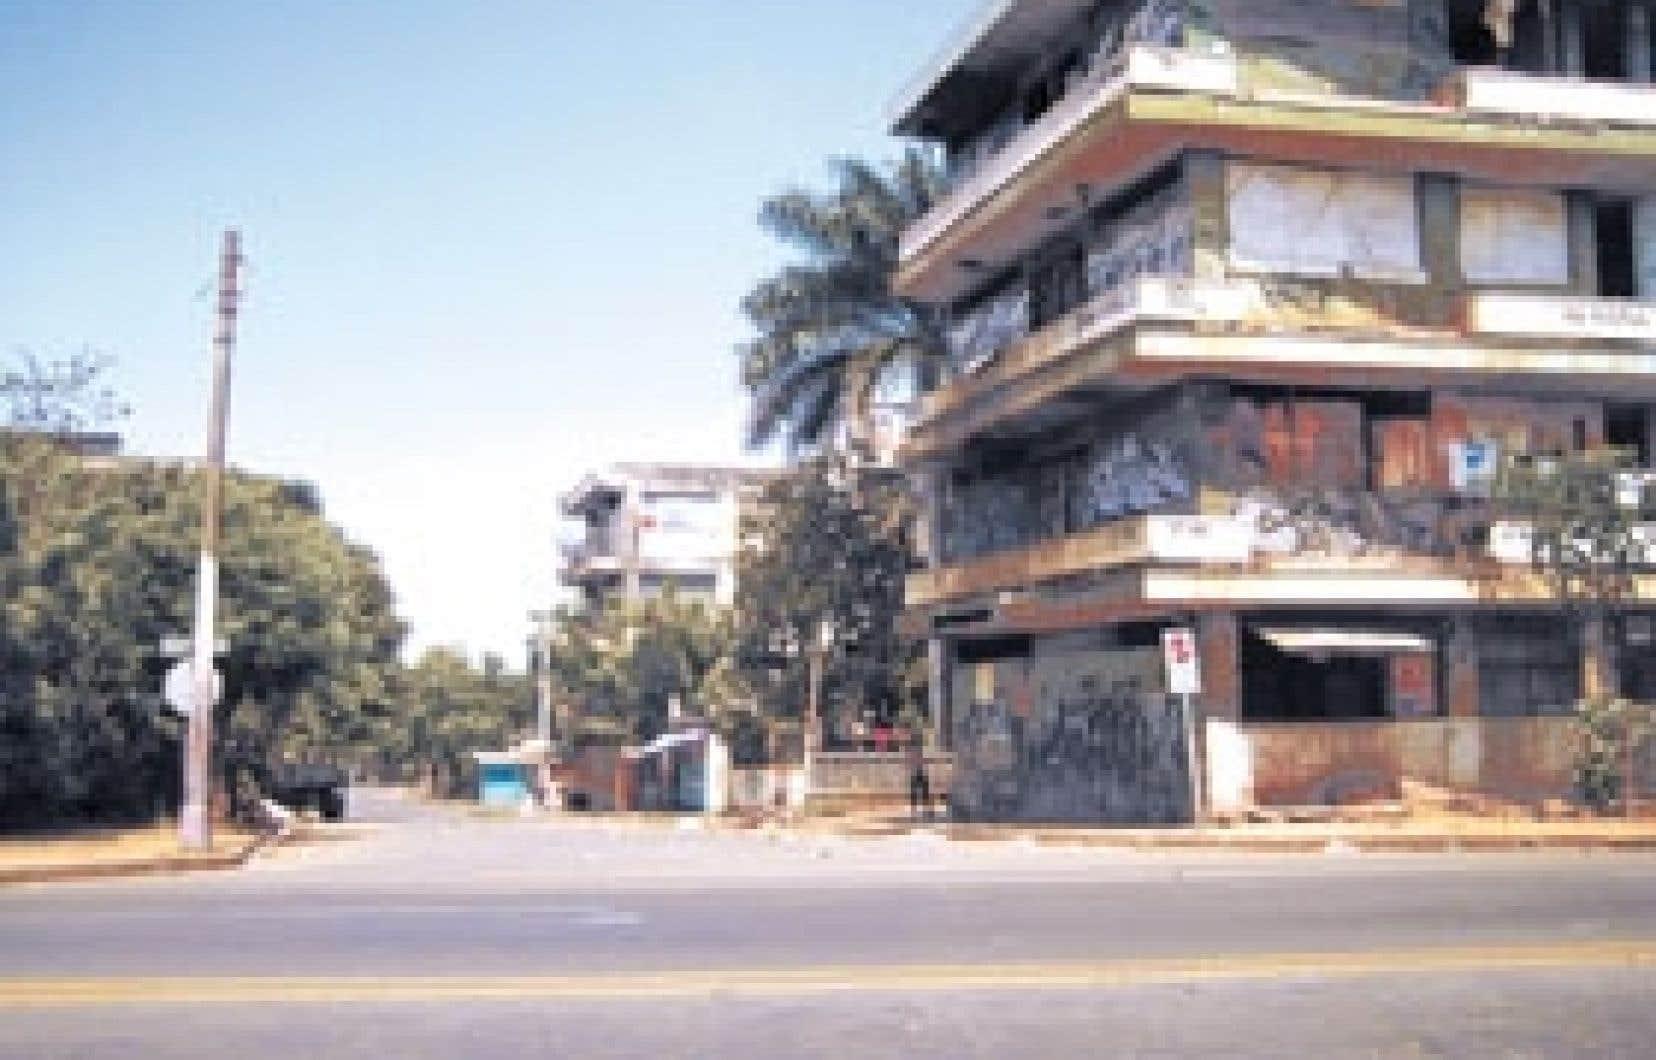 Immeuble barricadé de Managua au Nicaragua.